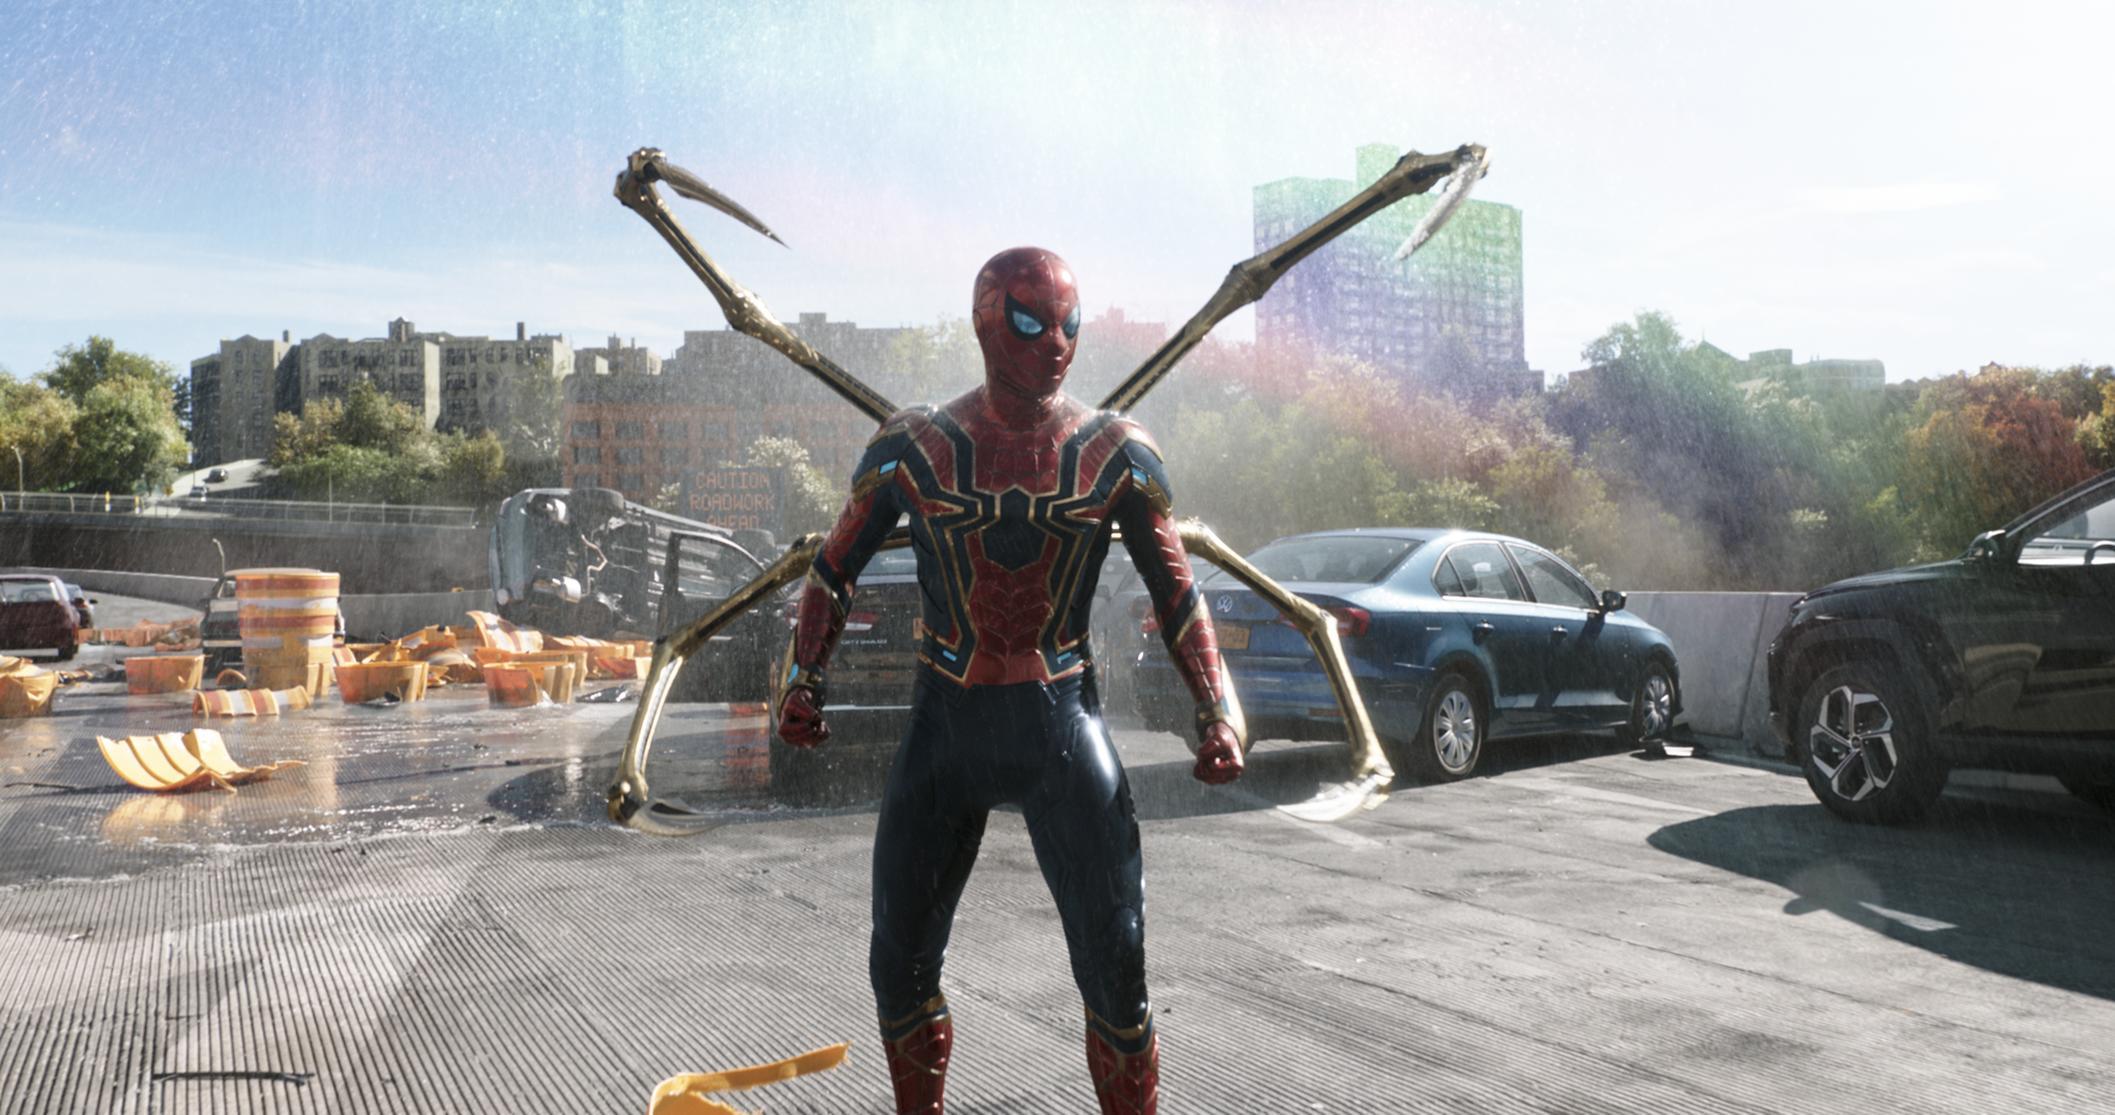 Spider-Man: No Way Home: trailer italiano e data d'uscita